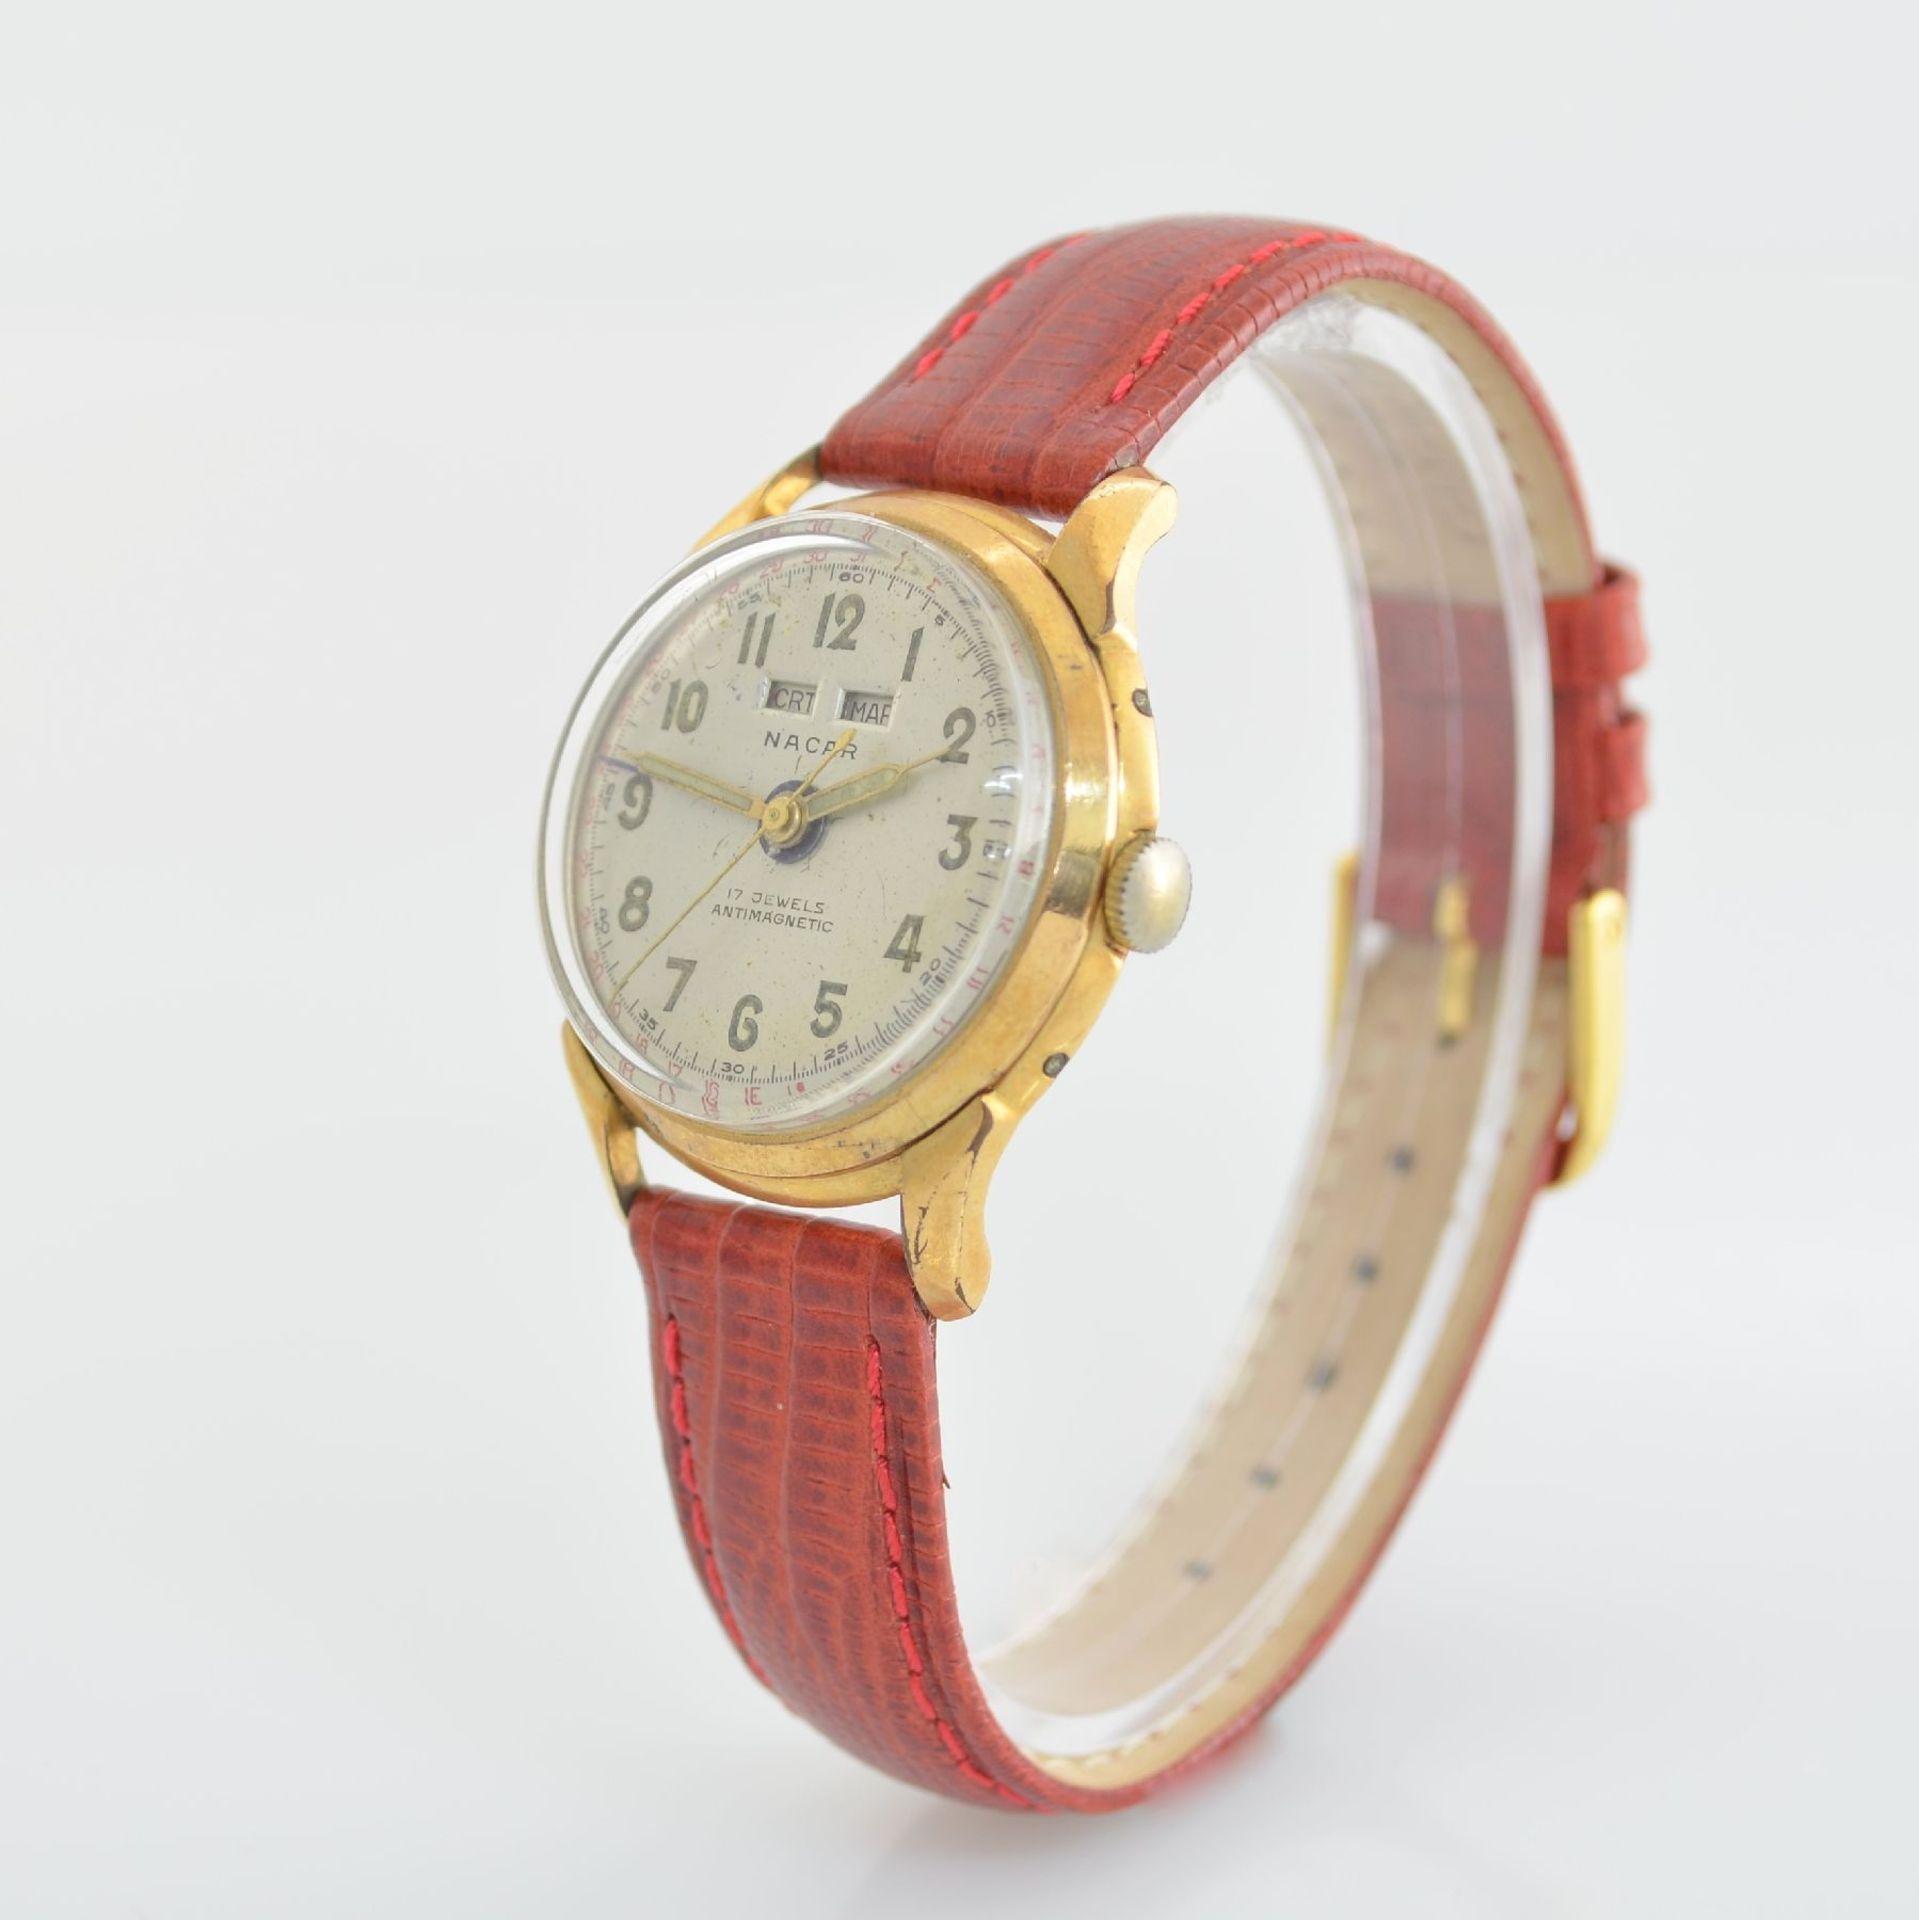 Konvolut: 2 Armbanduhren mit Kalender bzw. Datum, Schweiz um 1950-1960, Handaufzug, 1) NACAR m. - Bild 3 aus 12